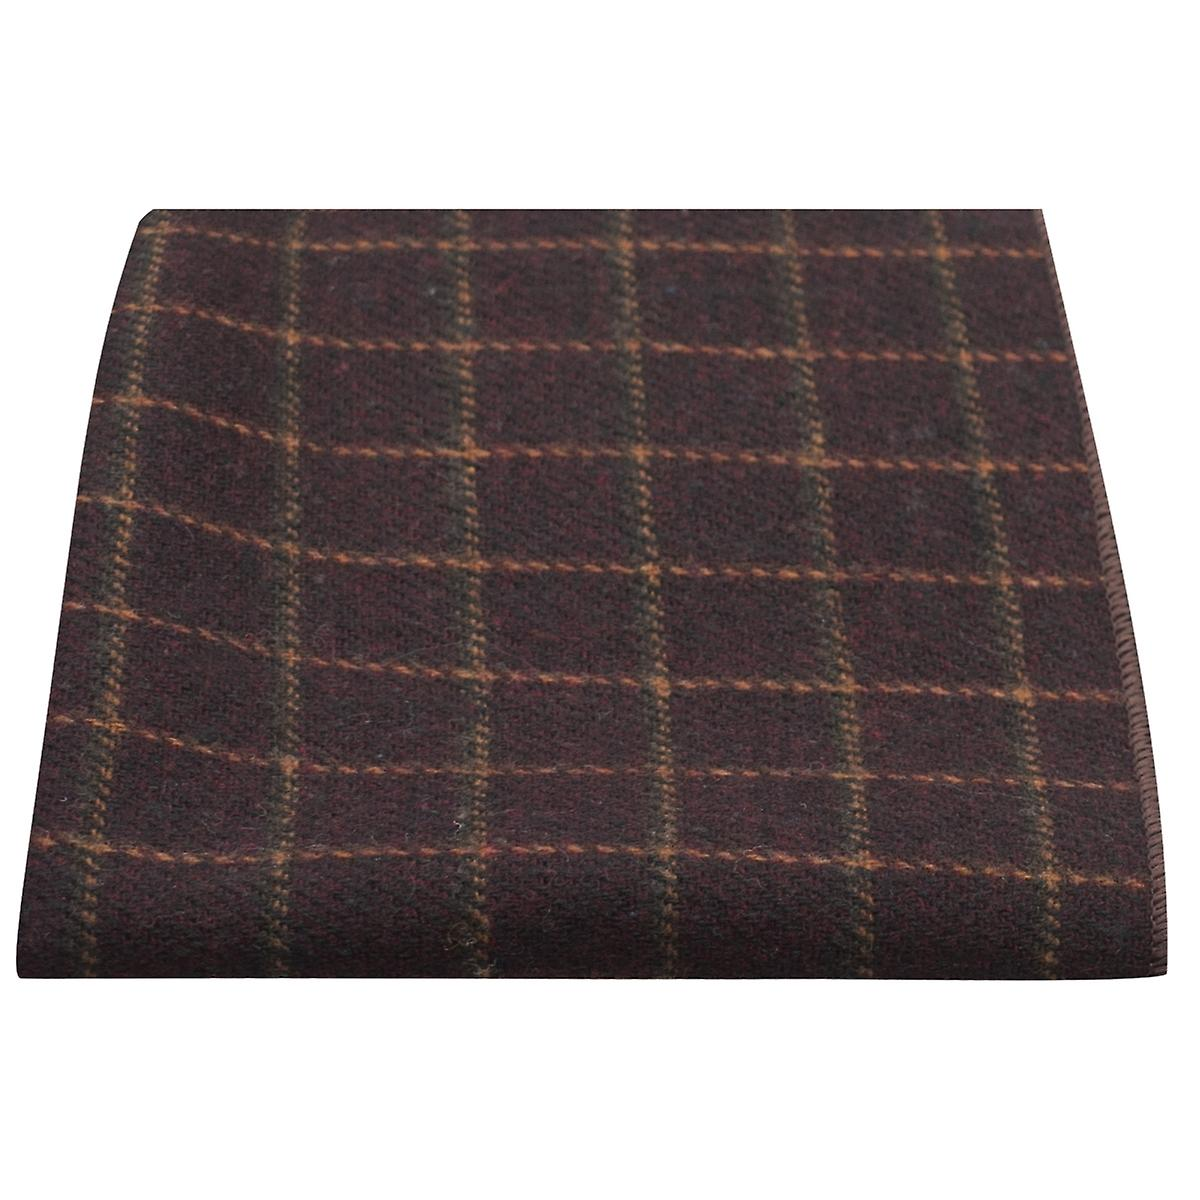 Luxury Merlot Red Tattersall Check Tweed Pocket Square, Handkerchief